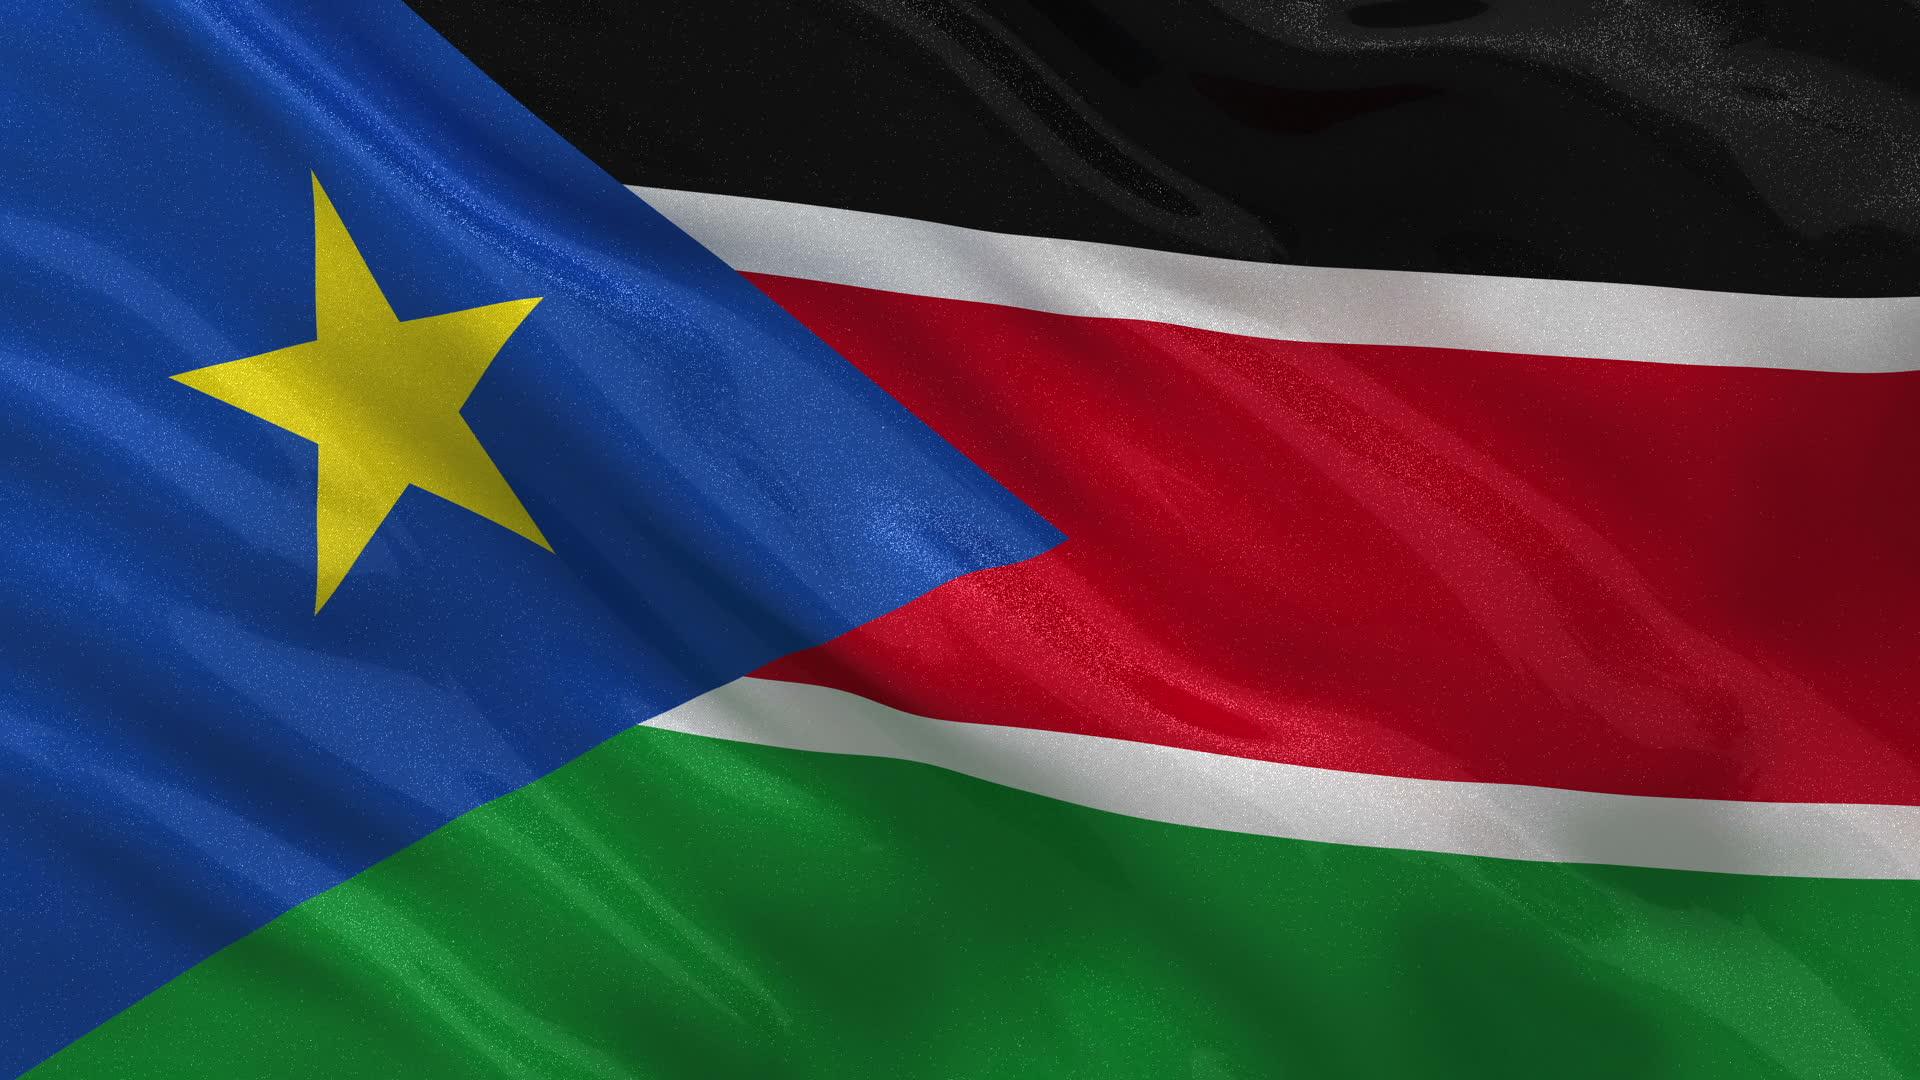 South Sudan Flag   Wallpaper High Definition High Quality 1920x1080